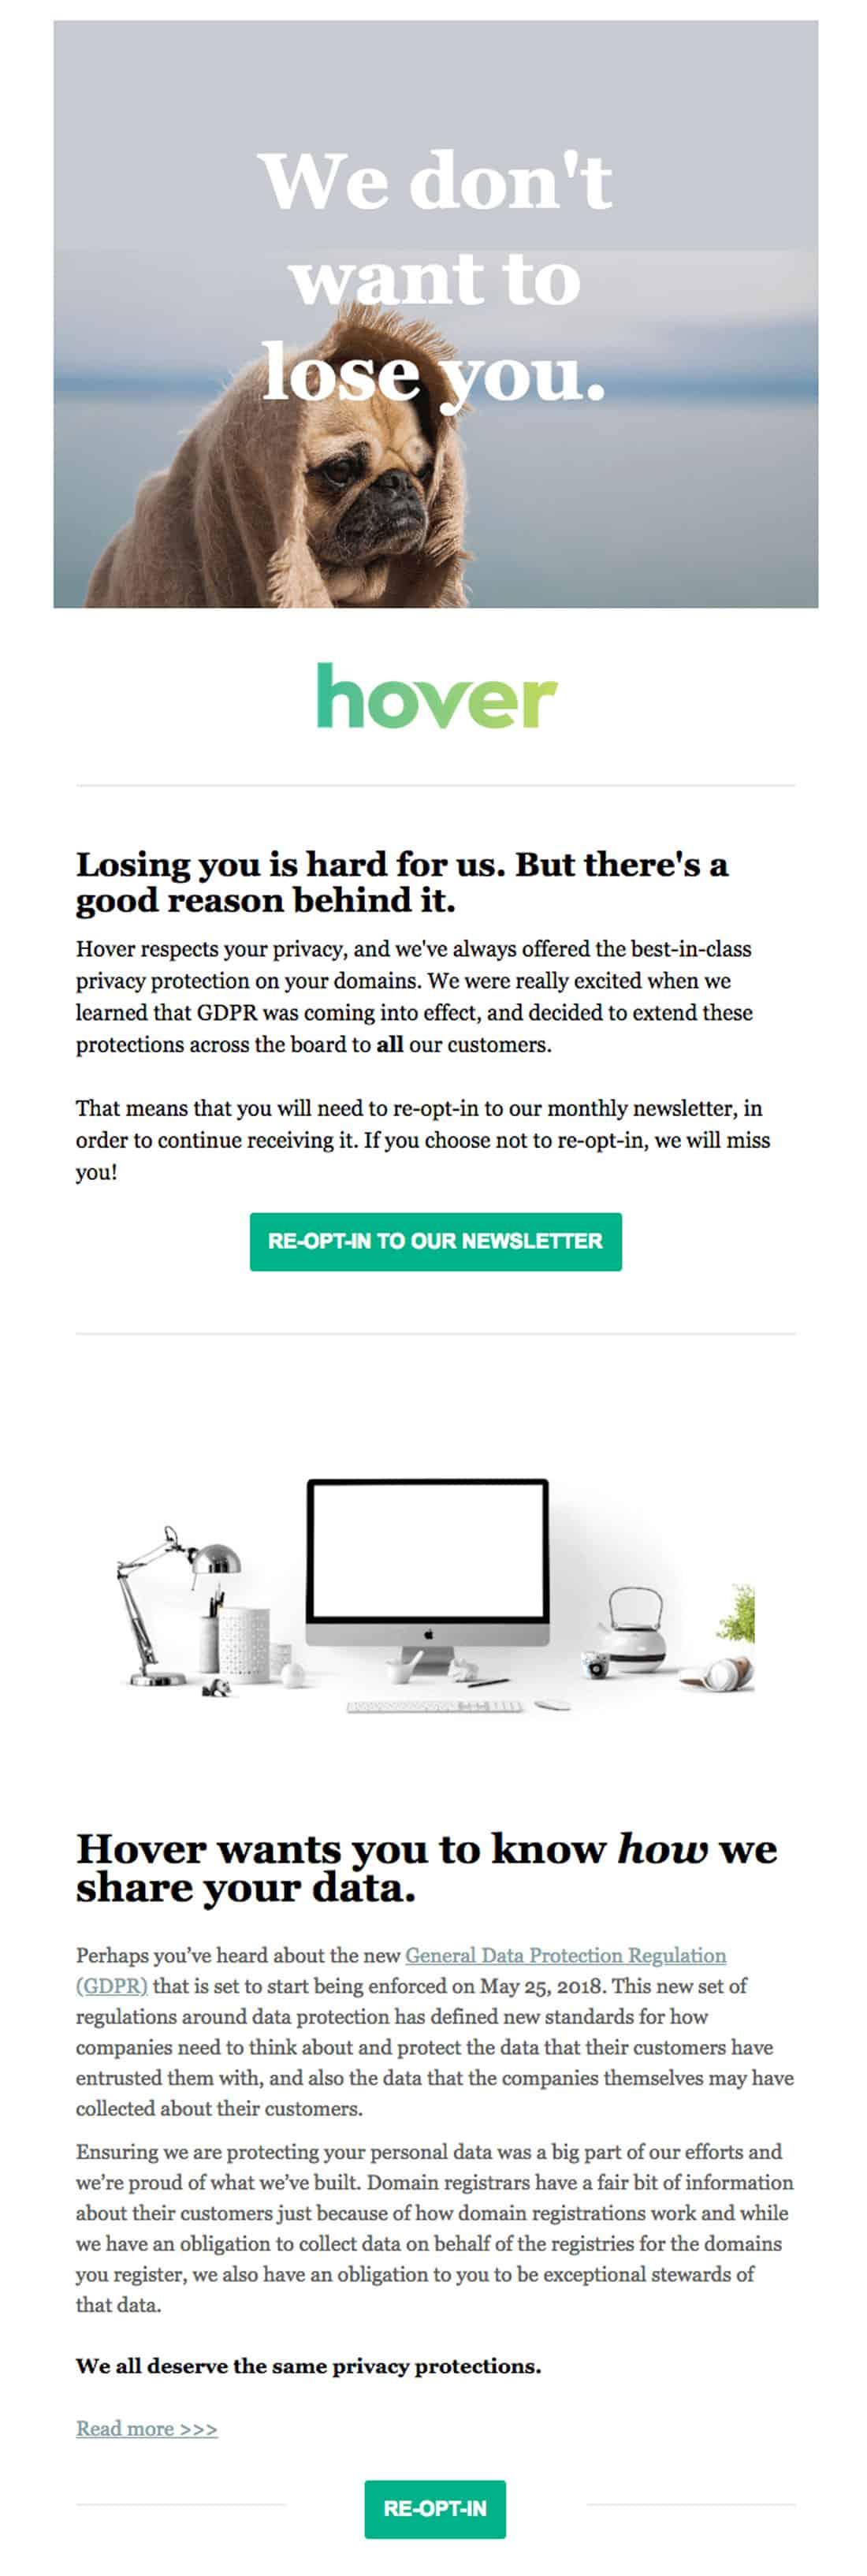 3cfe4bcc8d1393e73791b77fc4cad03f 7 Tips for Sending Better Email Newsletters design tips